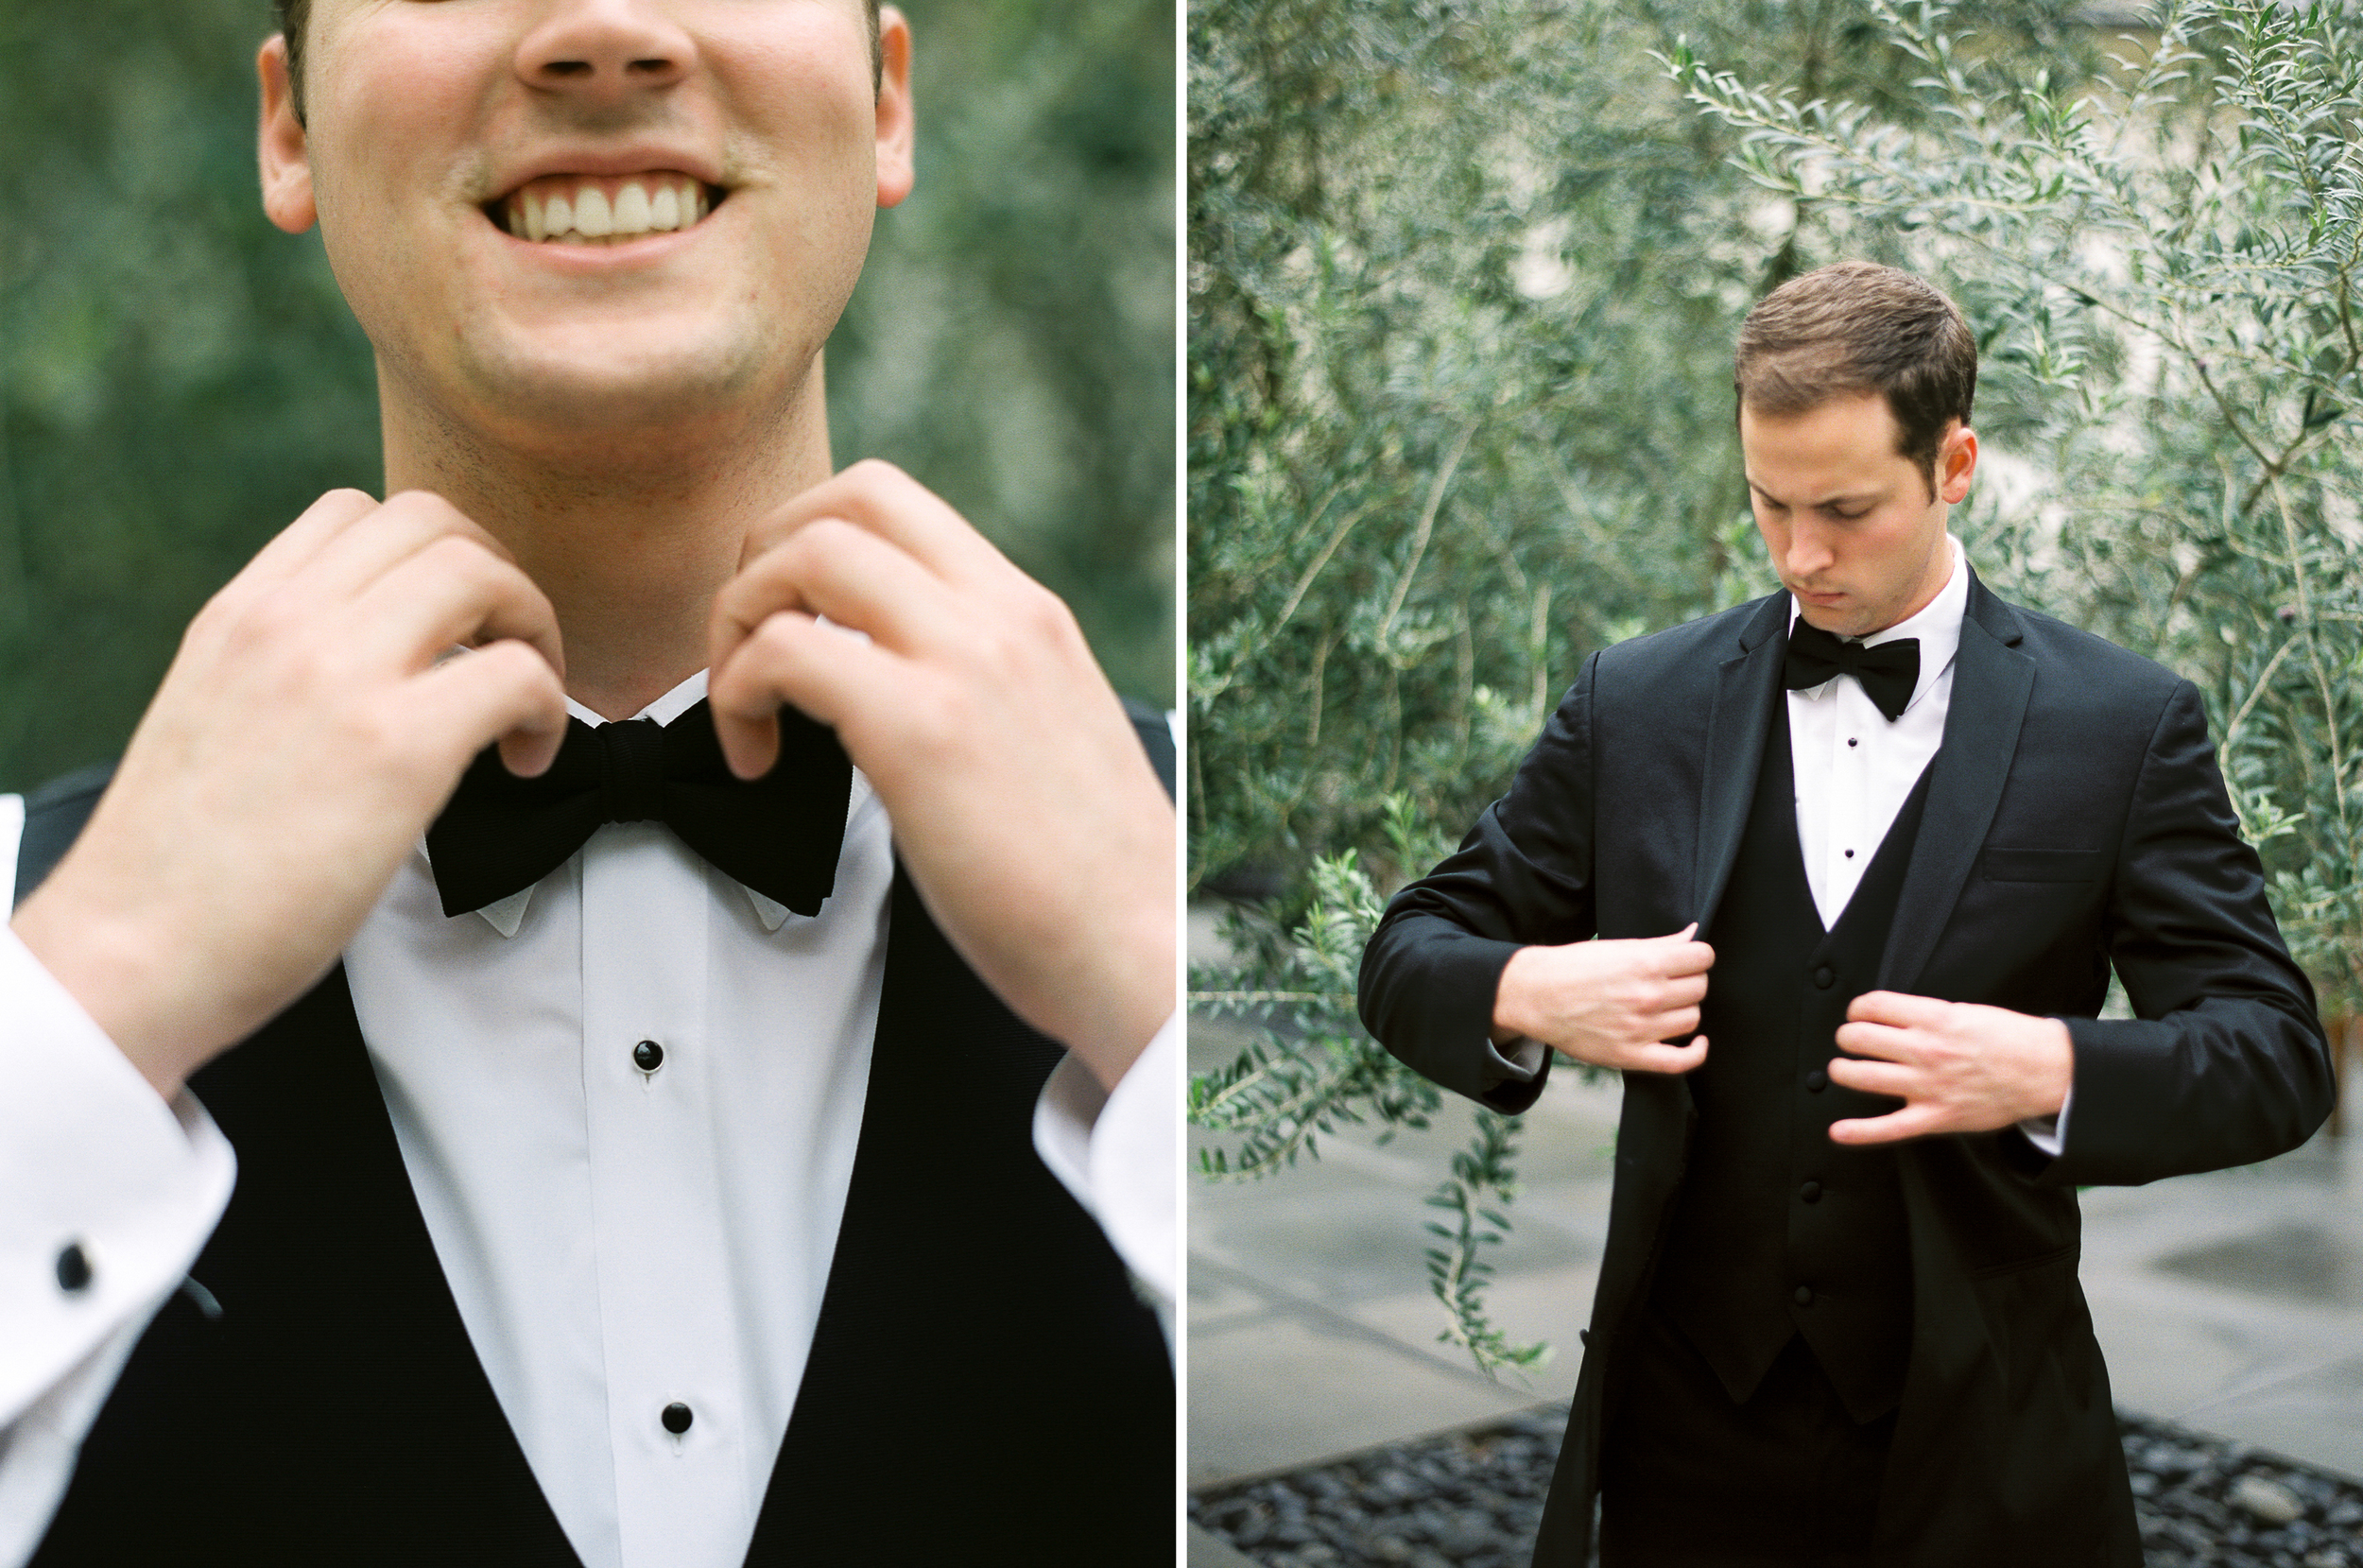 Dana-Fernandez-Photography-Weddings-in-Houston-Magazine-feature-Houston-wedding-photographer-film-111.jpg